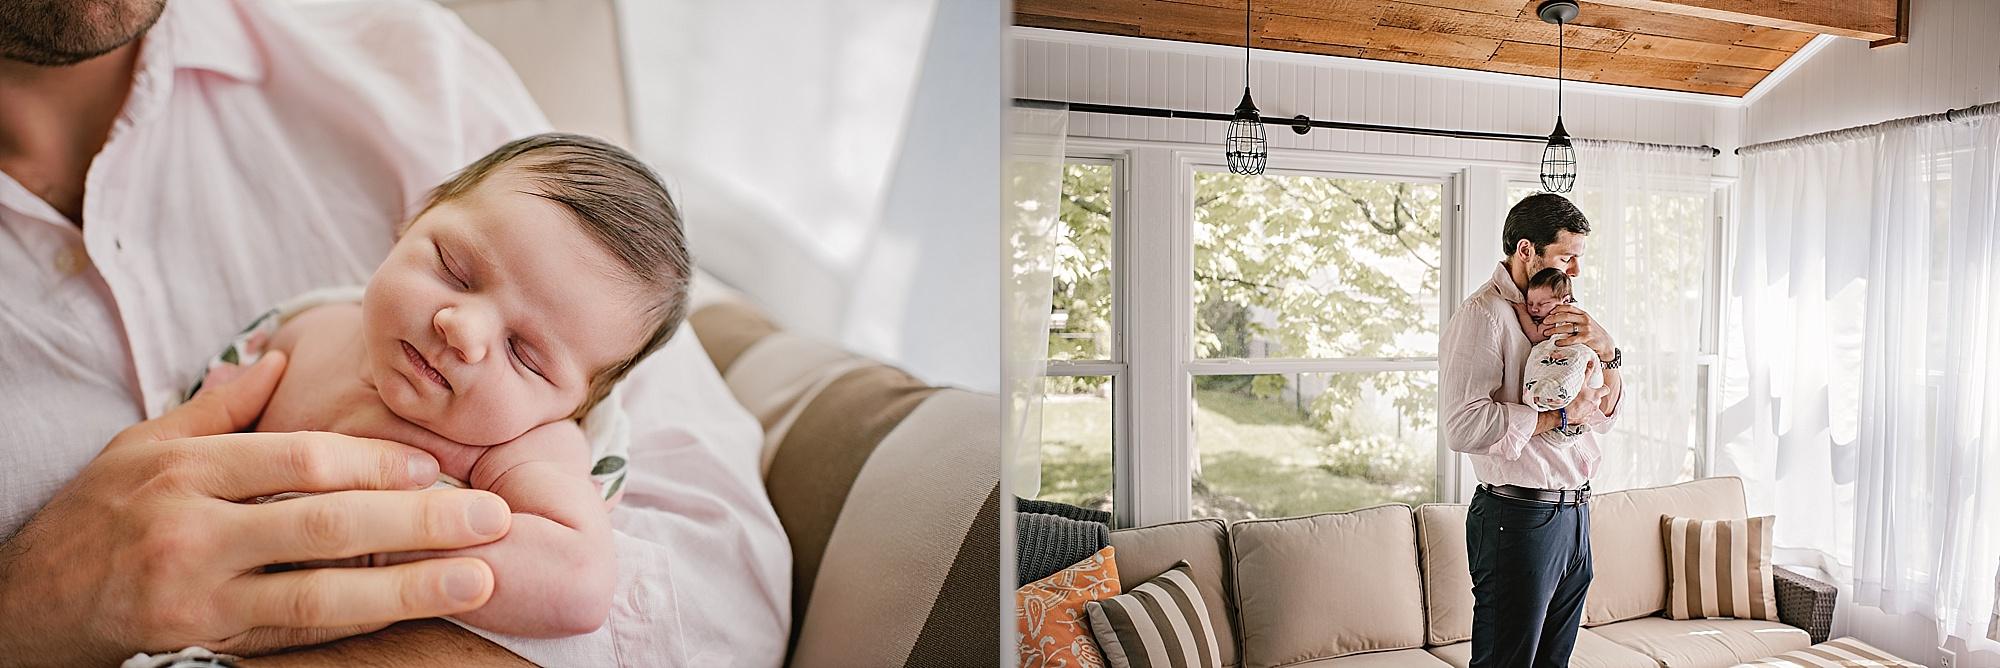 lauren-grayson-photography-cleveland-ohio-photographer-newborn-session-in-home-lifestyle-newborn-family-vivian_0640.jpg